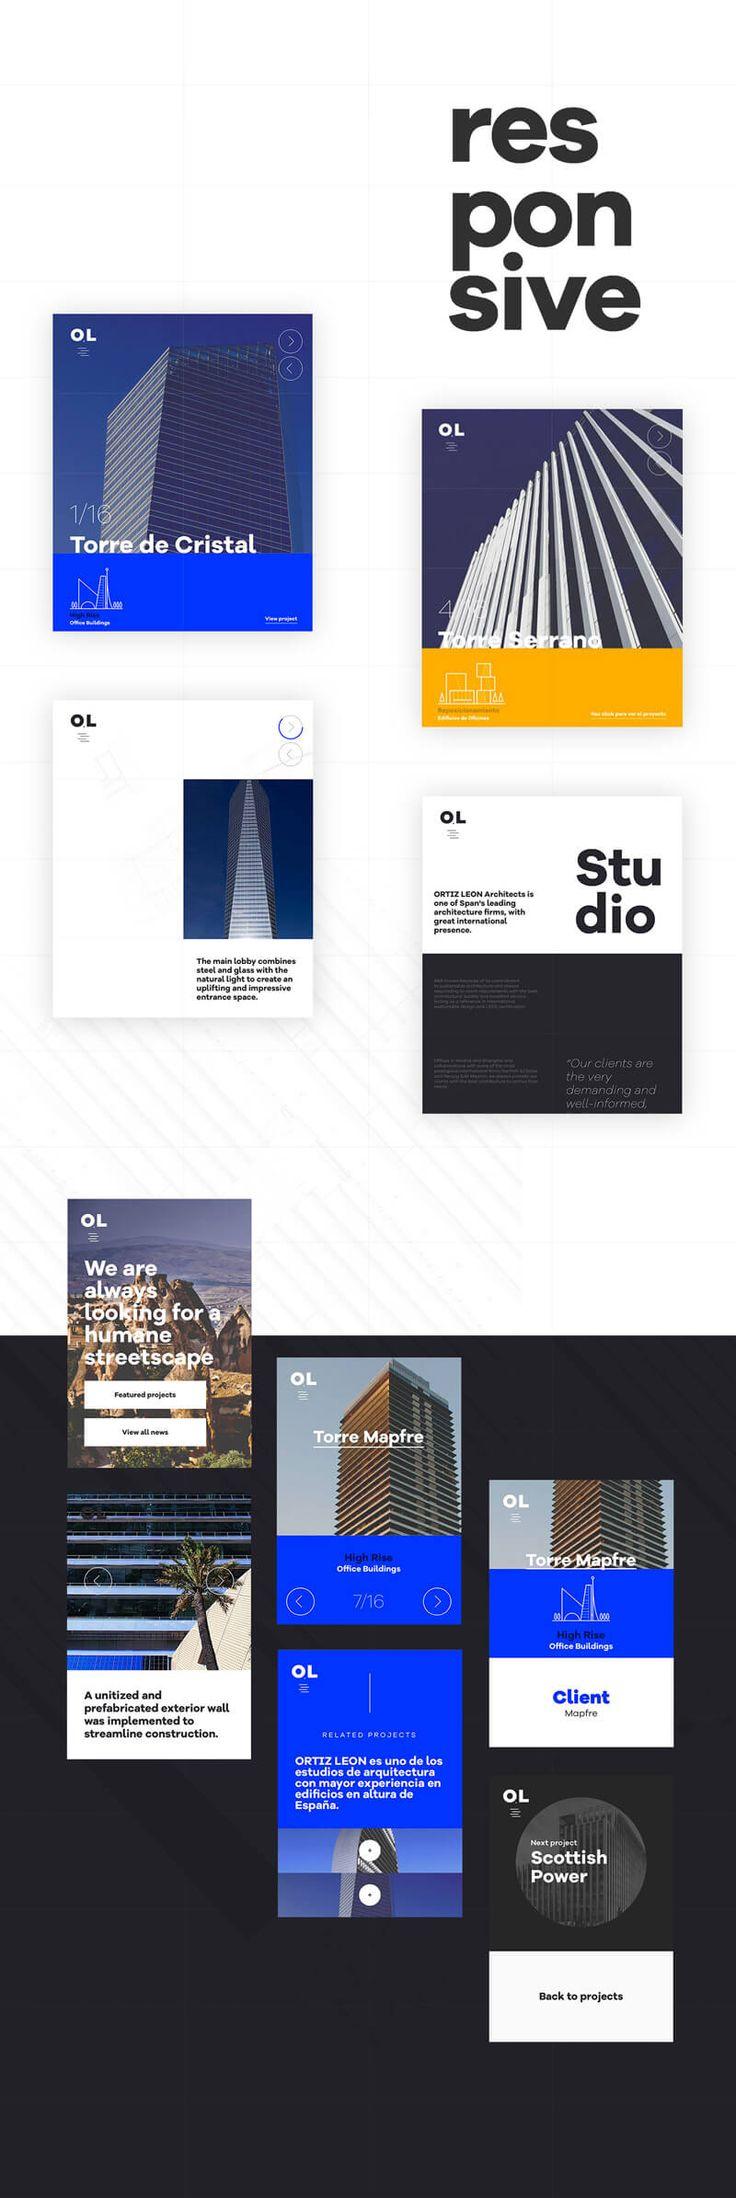 Ortiz-Leon2 #ui #ux #userexperience #website #webdesign #design